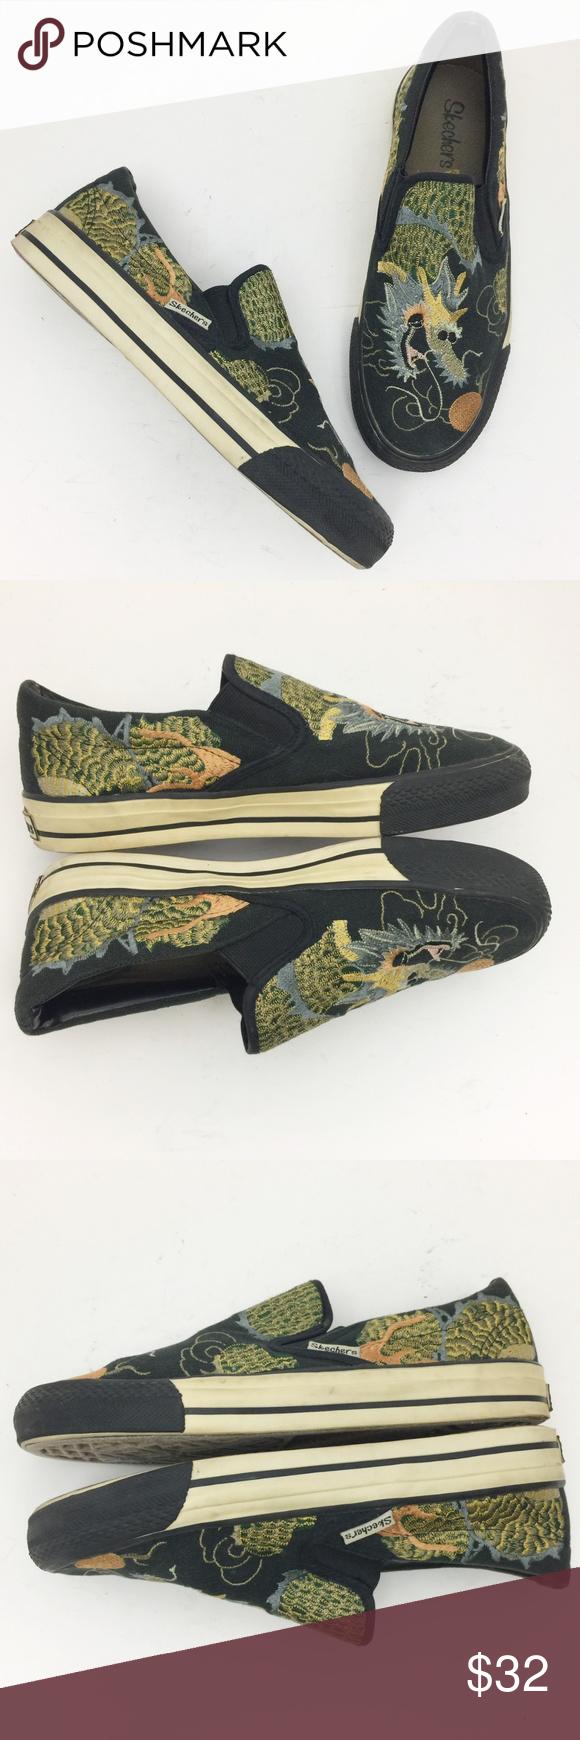 Skechers Cali Dragon Embroidered Slip On Sneakers Slip On